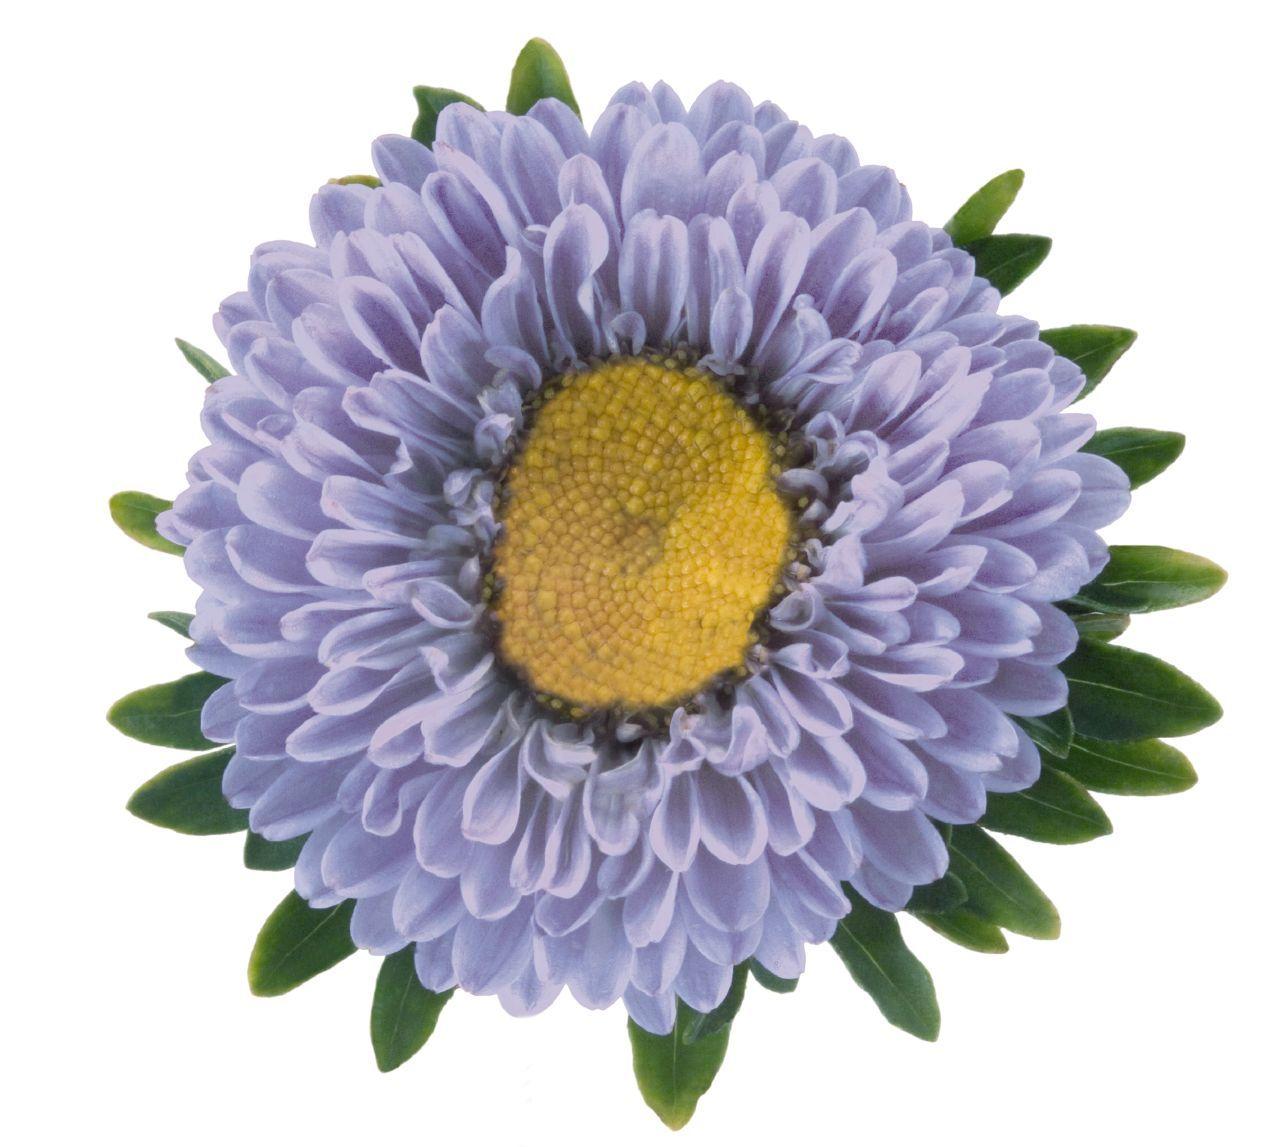 Pin by kim kelly cichocki on asters pinterest aster aster daisy margarita flower bellis perennis daisies izmirmasajfo